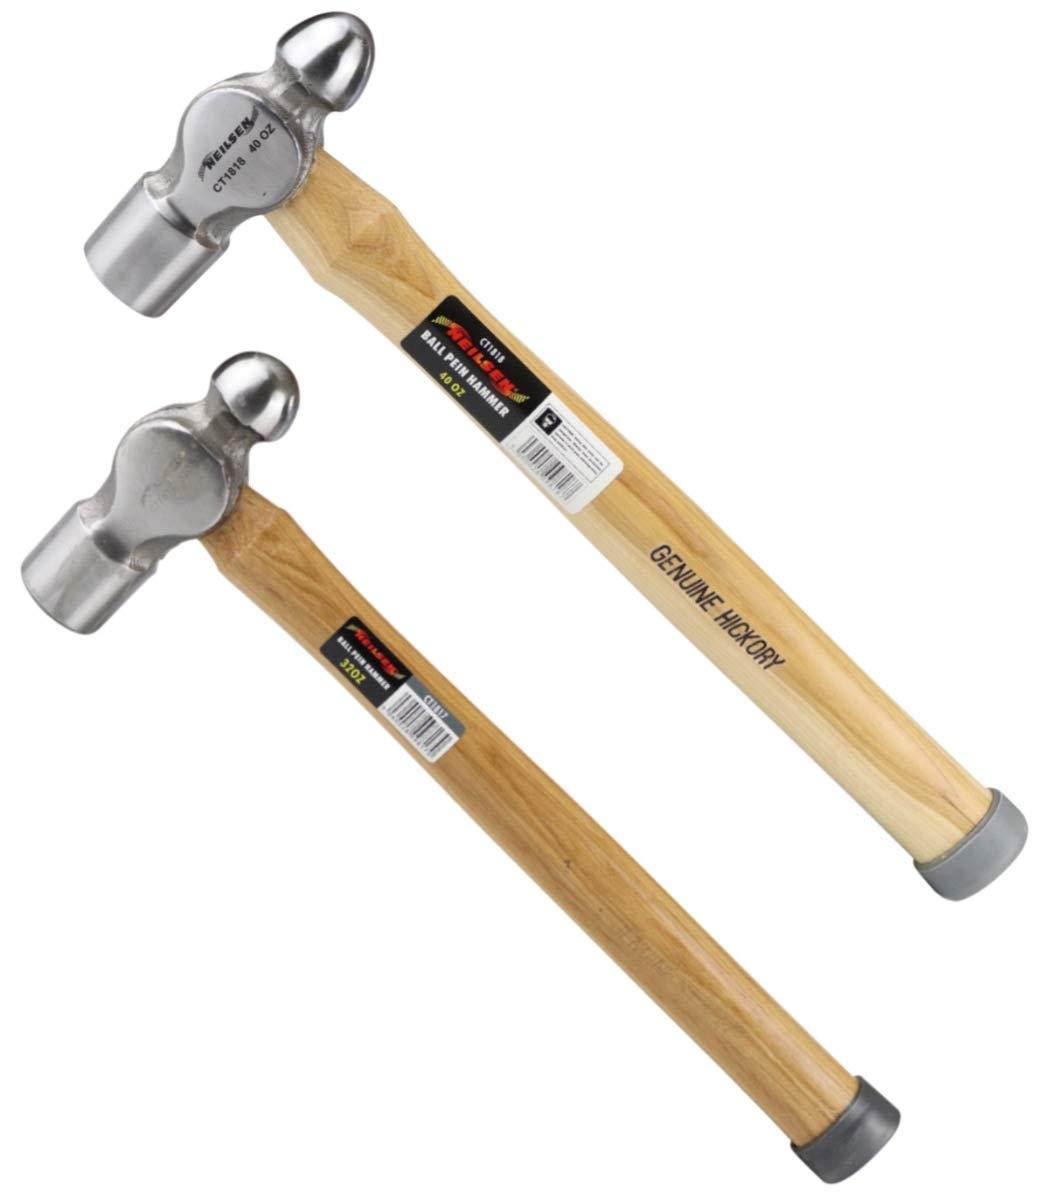 Buy 2 Ball Pein Hammers 32oz & 40oz Neilsen Wooden Genuine Hickory Handle CTPK2 MandyTools